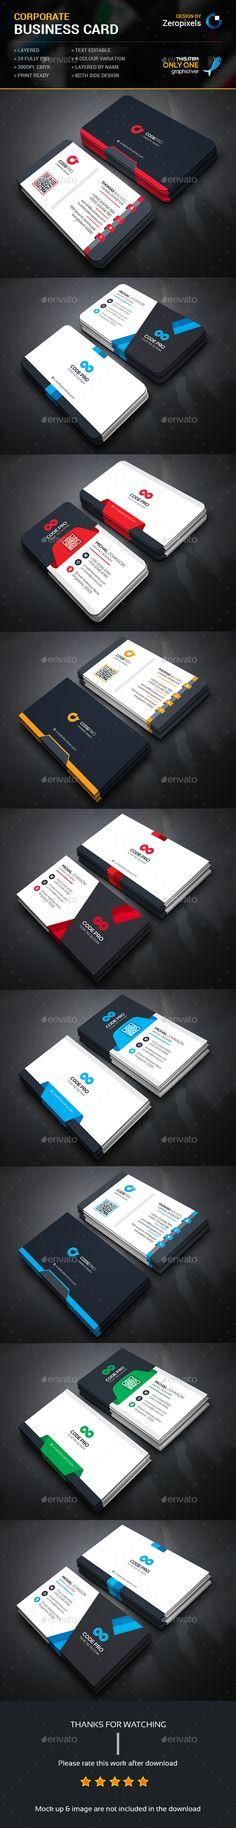 Business Template PSD Card Bundle. Download here: http://graphicriver.net/item/business-card-bundle/15233401?ref=ksioks